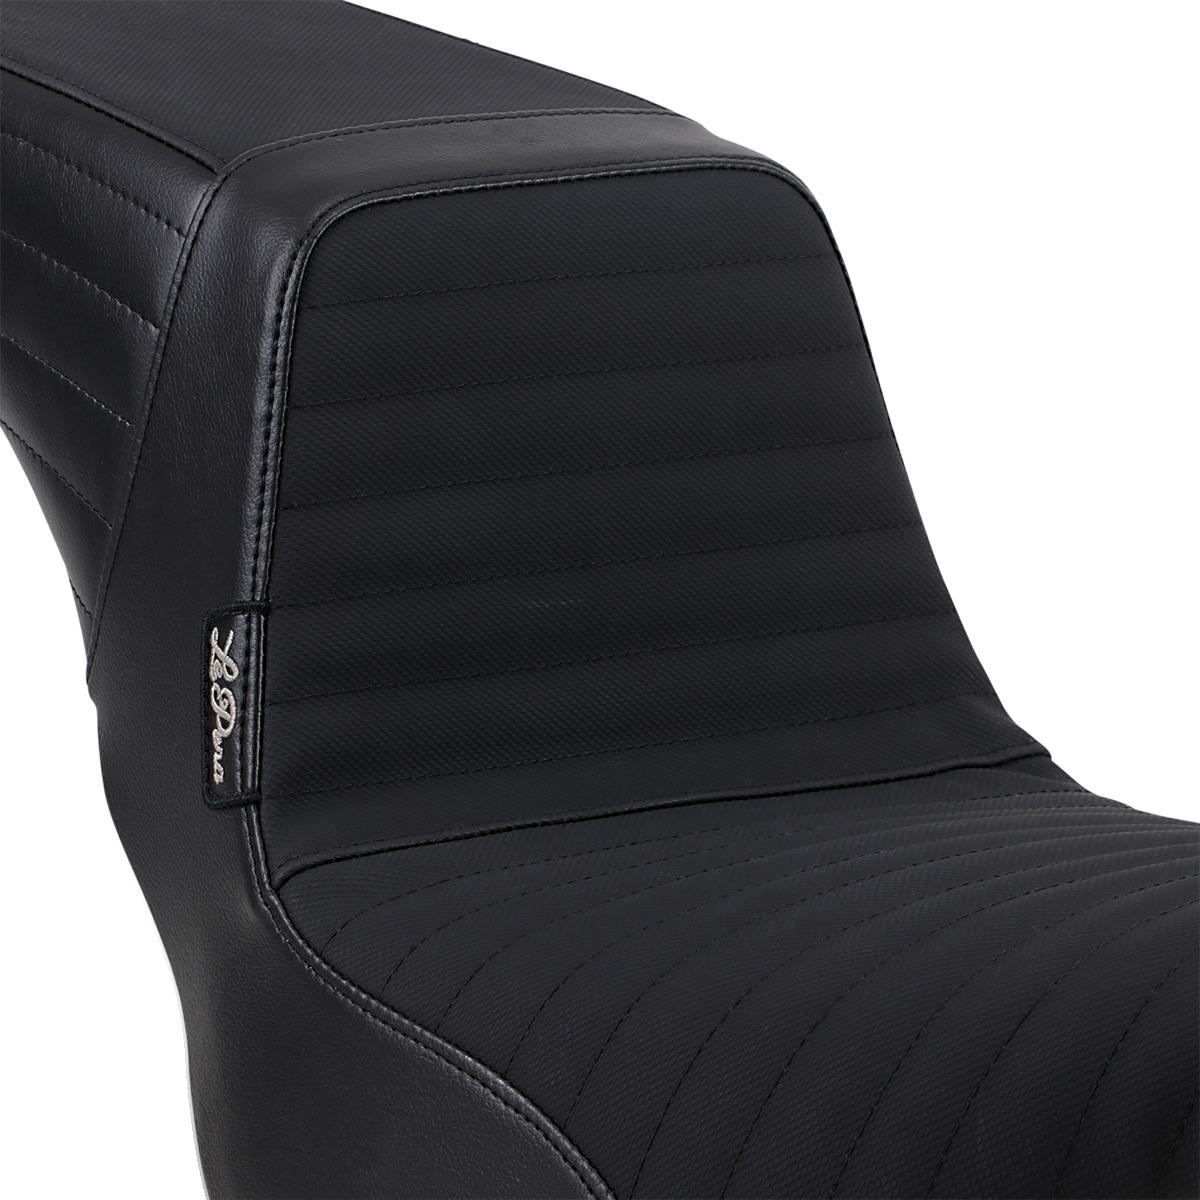 Le Pera Vinyl Black Pleated Grip Tape Kickflip Seat 18-19 Harley Softail FXBB